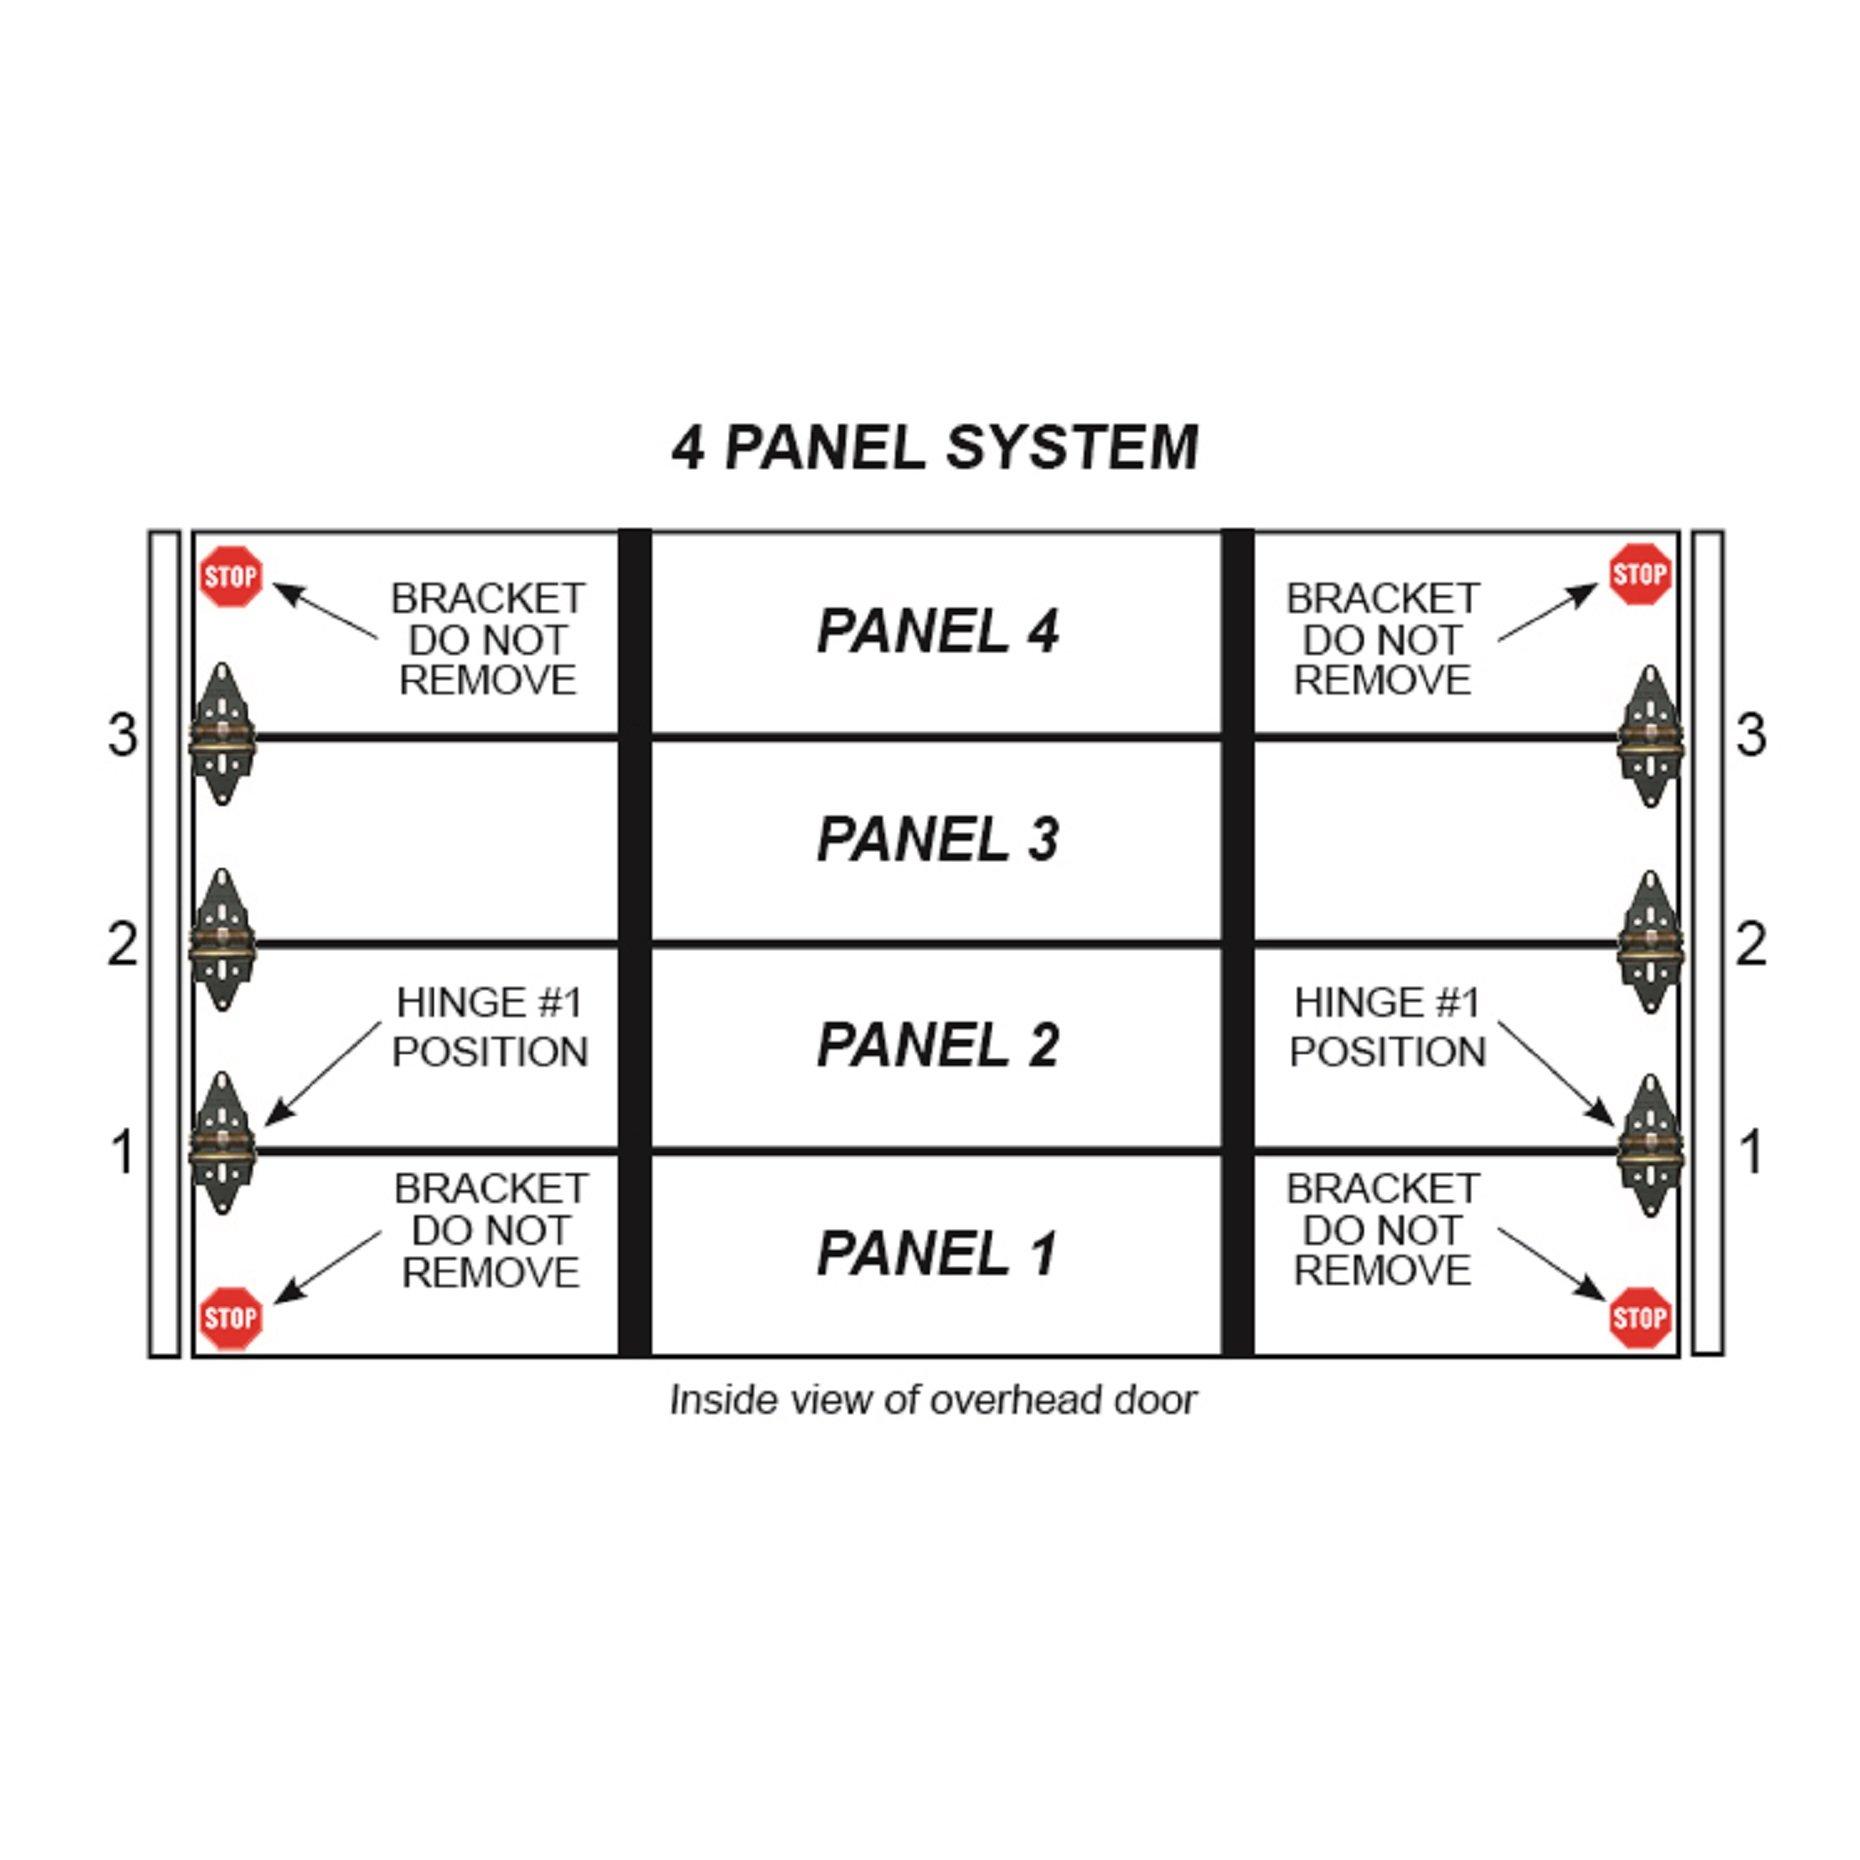 Energy Saving Garage Door Hinge, Residential Set, 4 Panel Door by Green Hinge (Image #7)